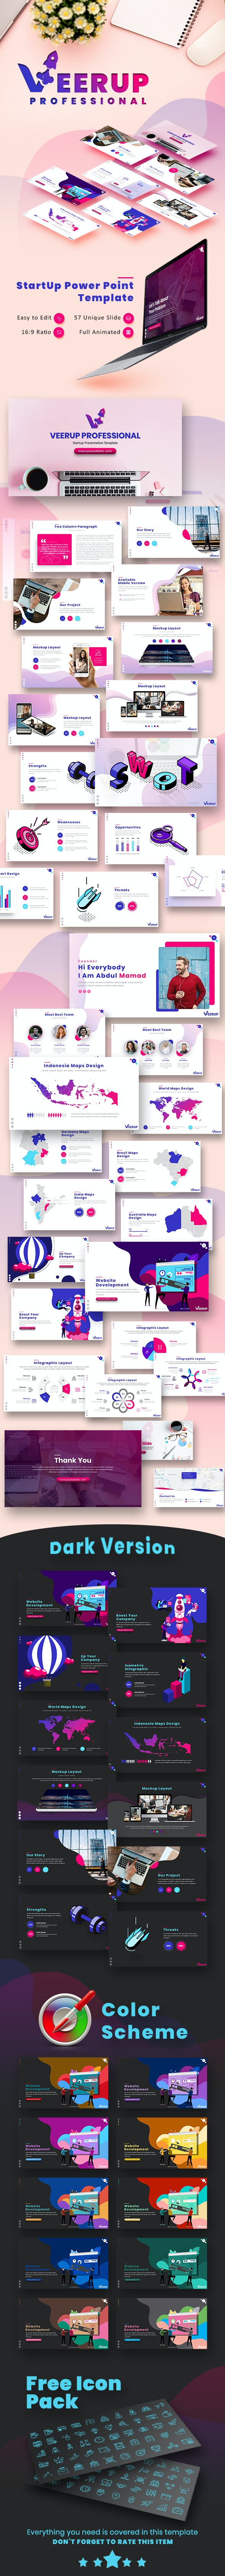 VeerUp Professional Presentation Template - Creative PowerPoint Templates